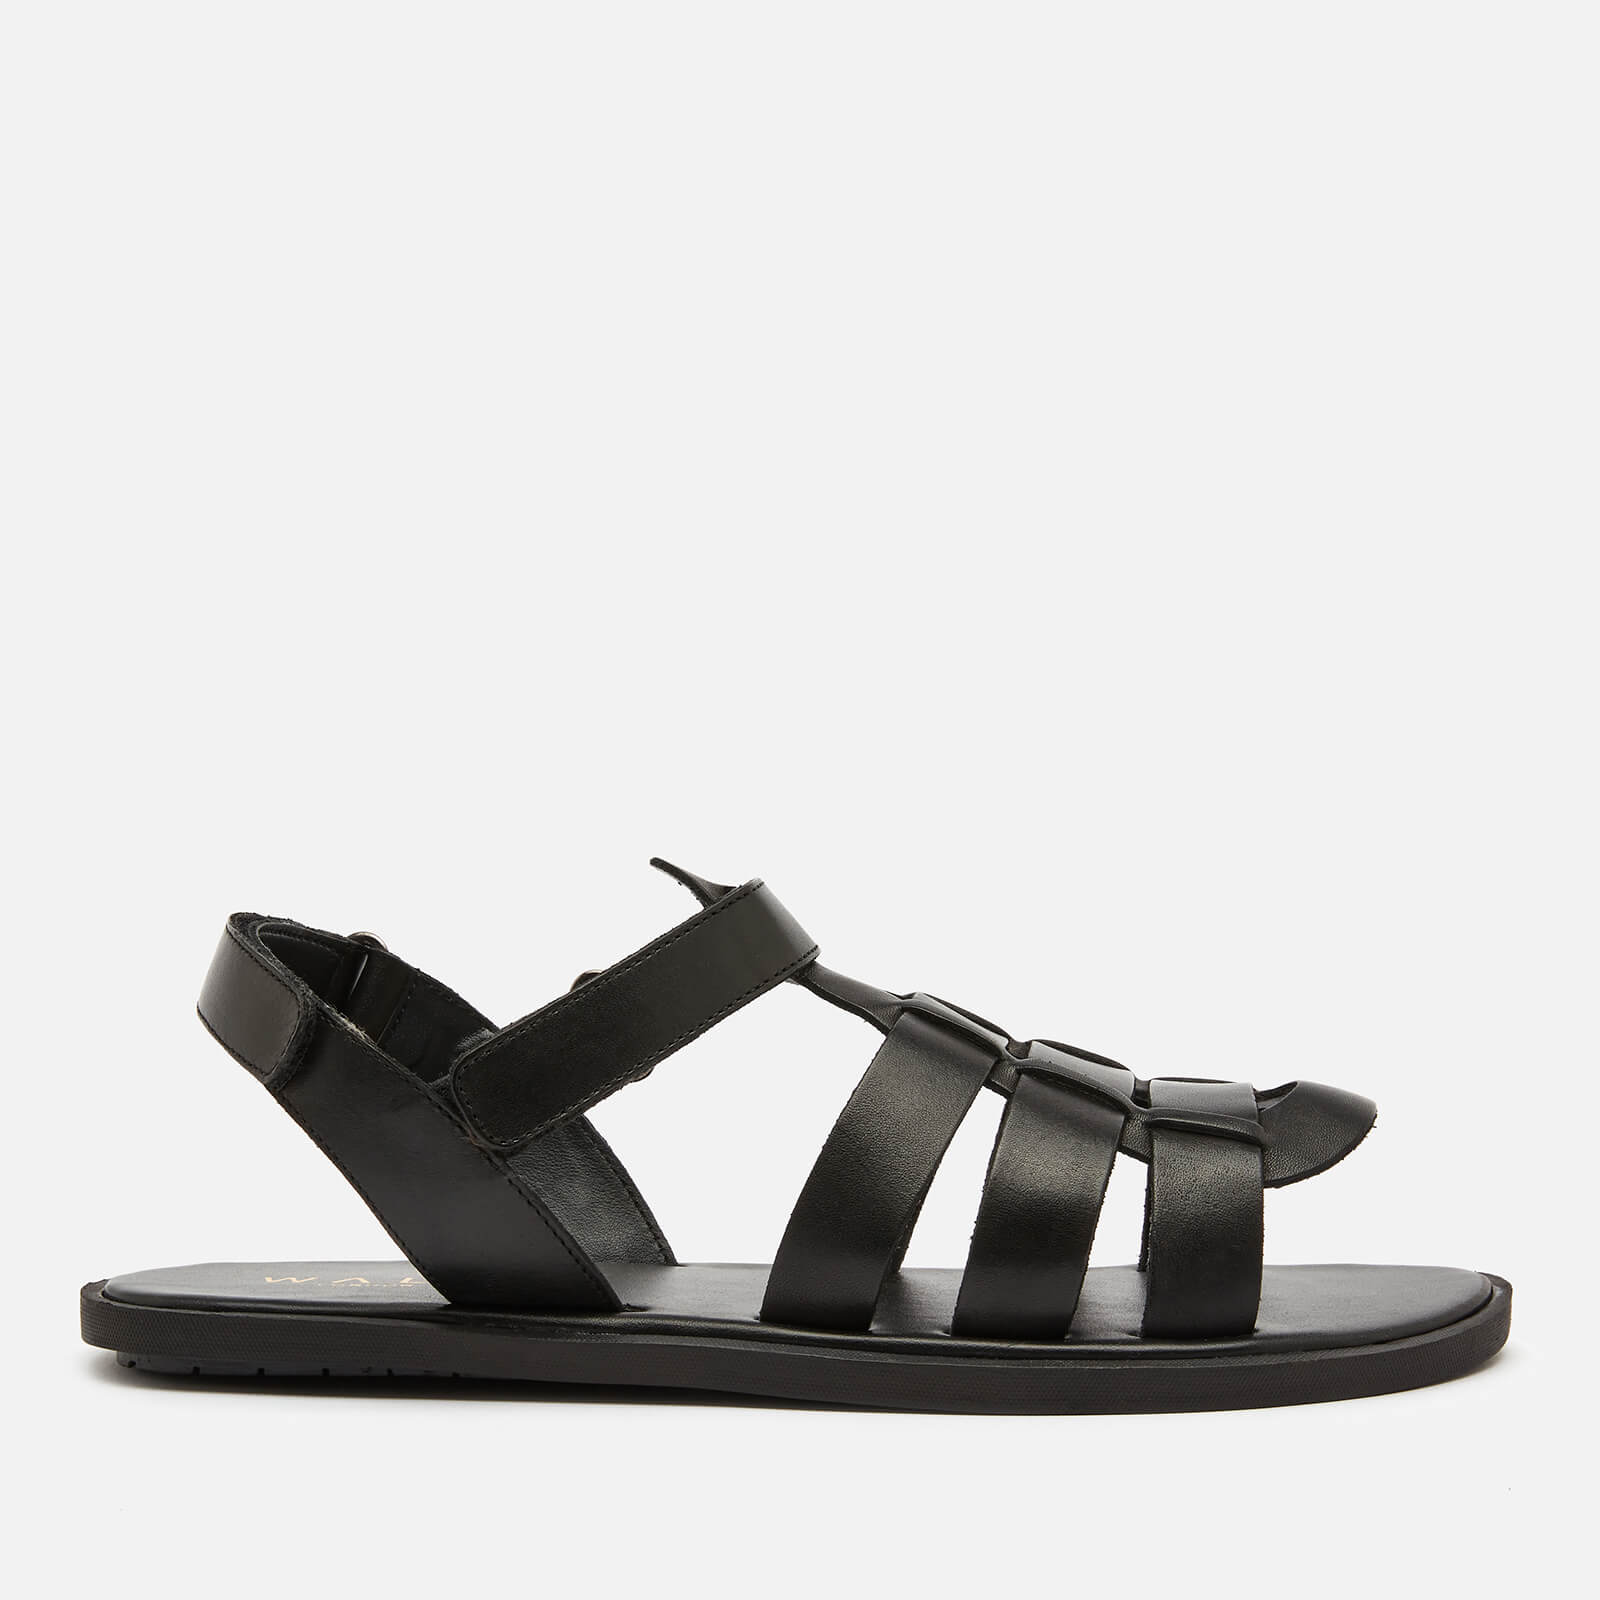 Walk London Men's Leather Gladiator Sandals - Black - UK 8